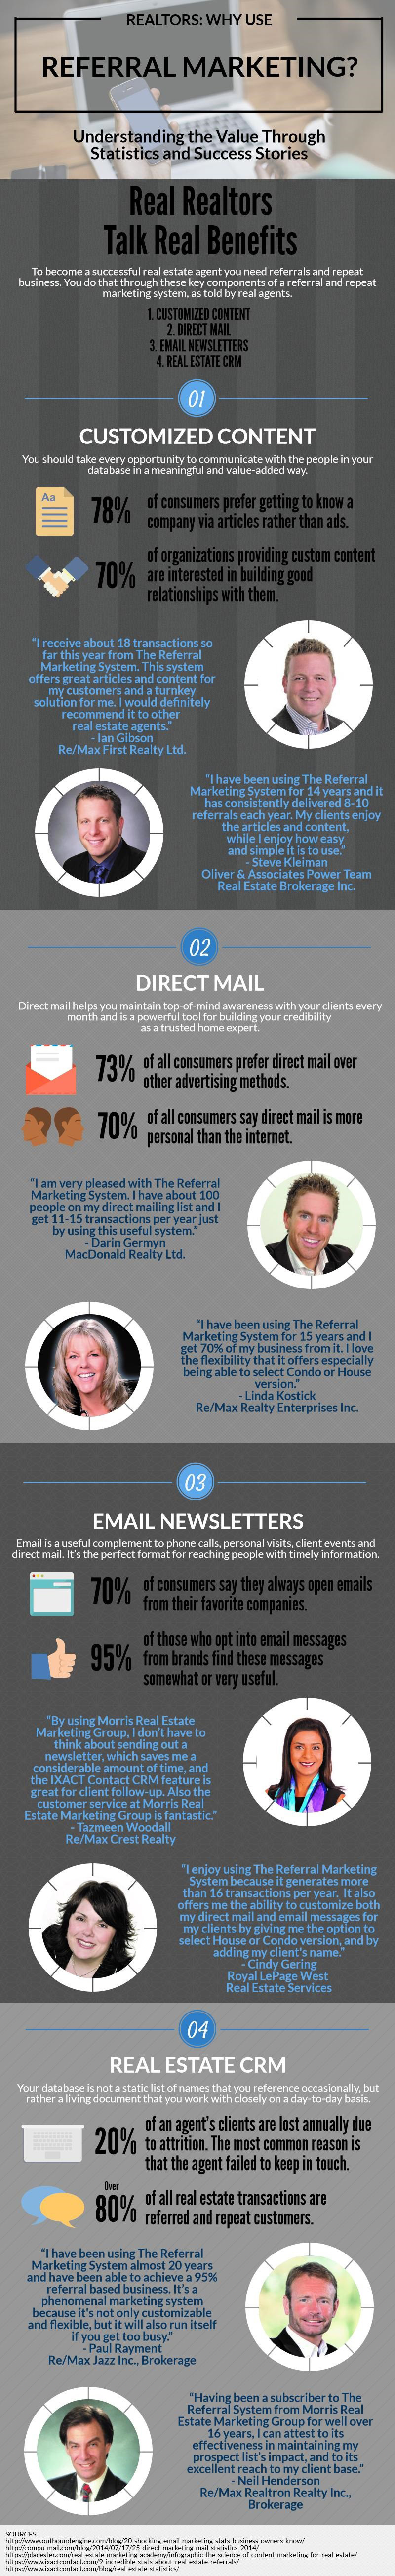 2016_Infographic_MorrisMarketingGroup-2